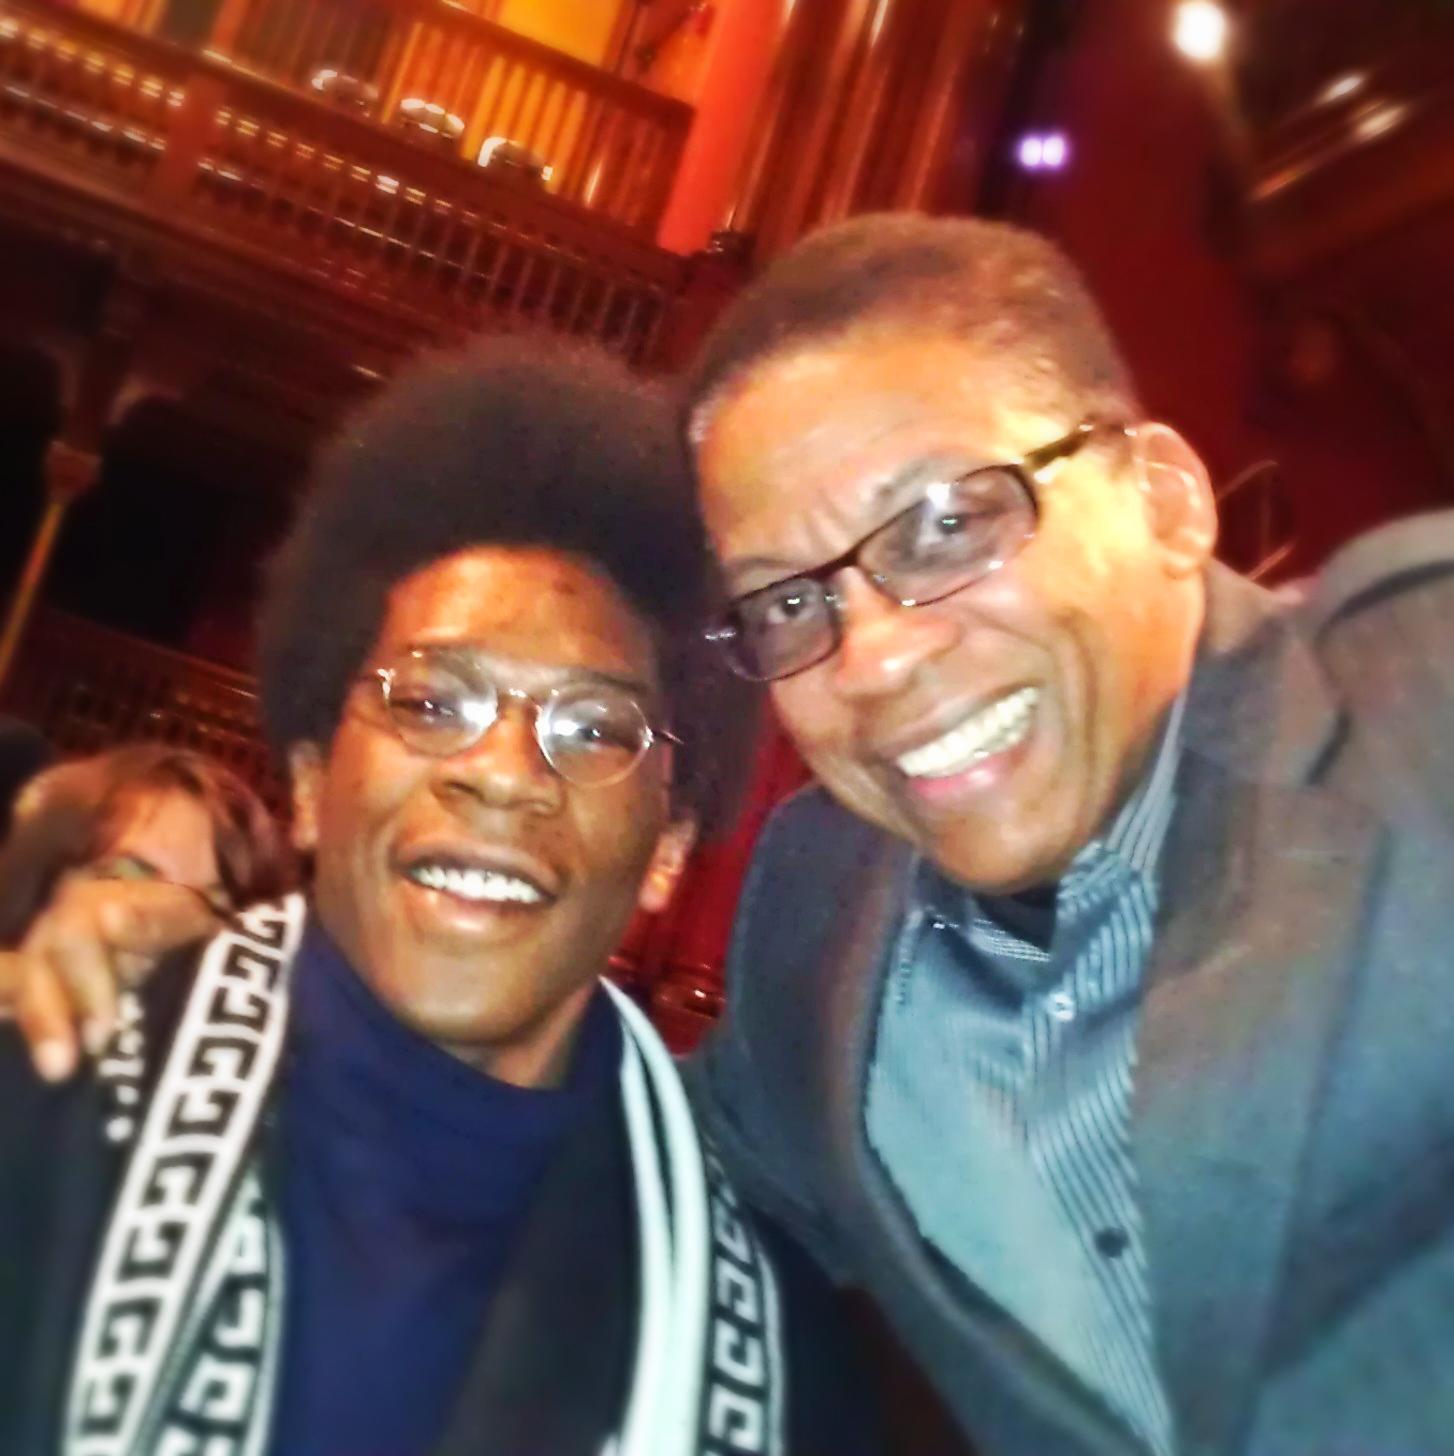 First time I met Herbie Hancock at Harvard.